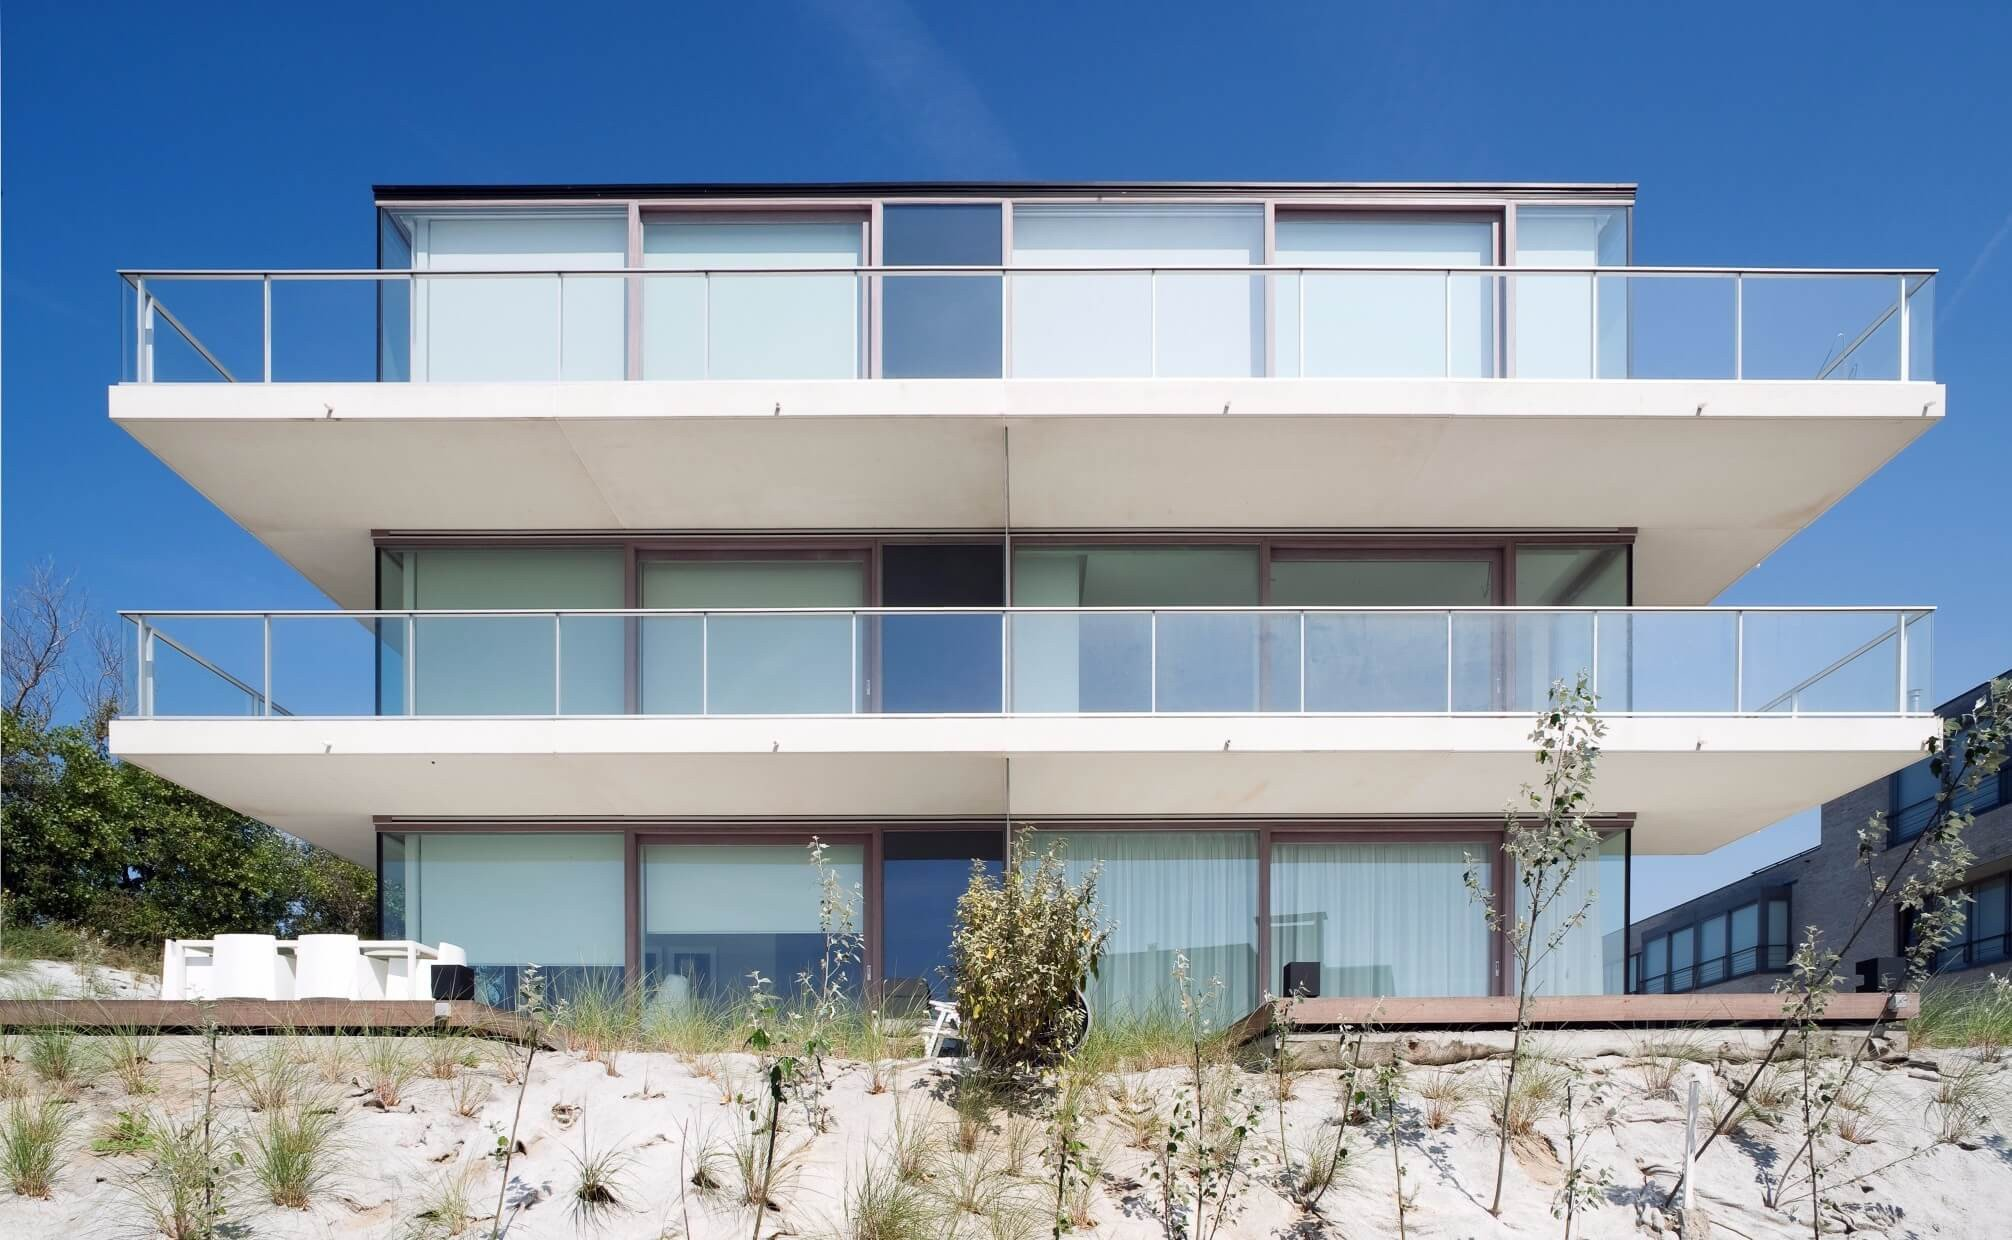 Rietveldprojects-Periscoop-appartement-design-architectuur-kust15